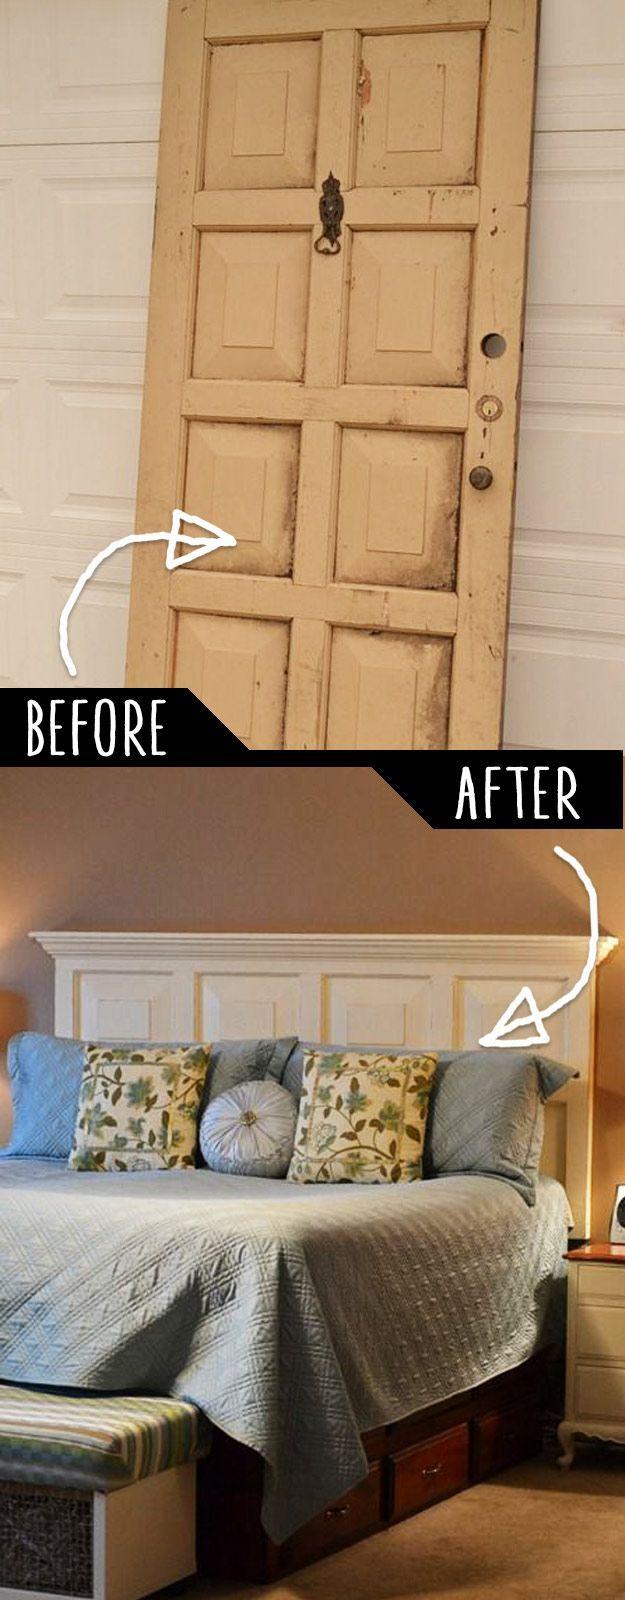 DIY Furniture Hacks | Door Headboard | Cool Ideas for Creative Do It Yourself Furniture | Cheap Home Decor Ideas for Bedroom, Bathroom, Living Room, Kitchen - http://philanthropyalamode.com/39-clever-diy-furniture-hacks/